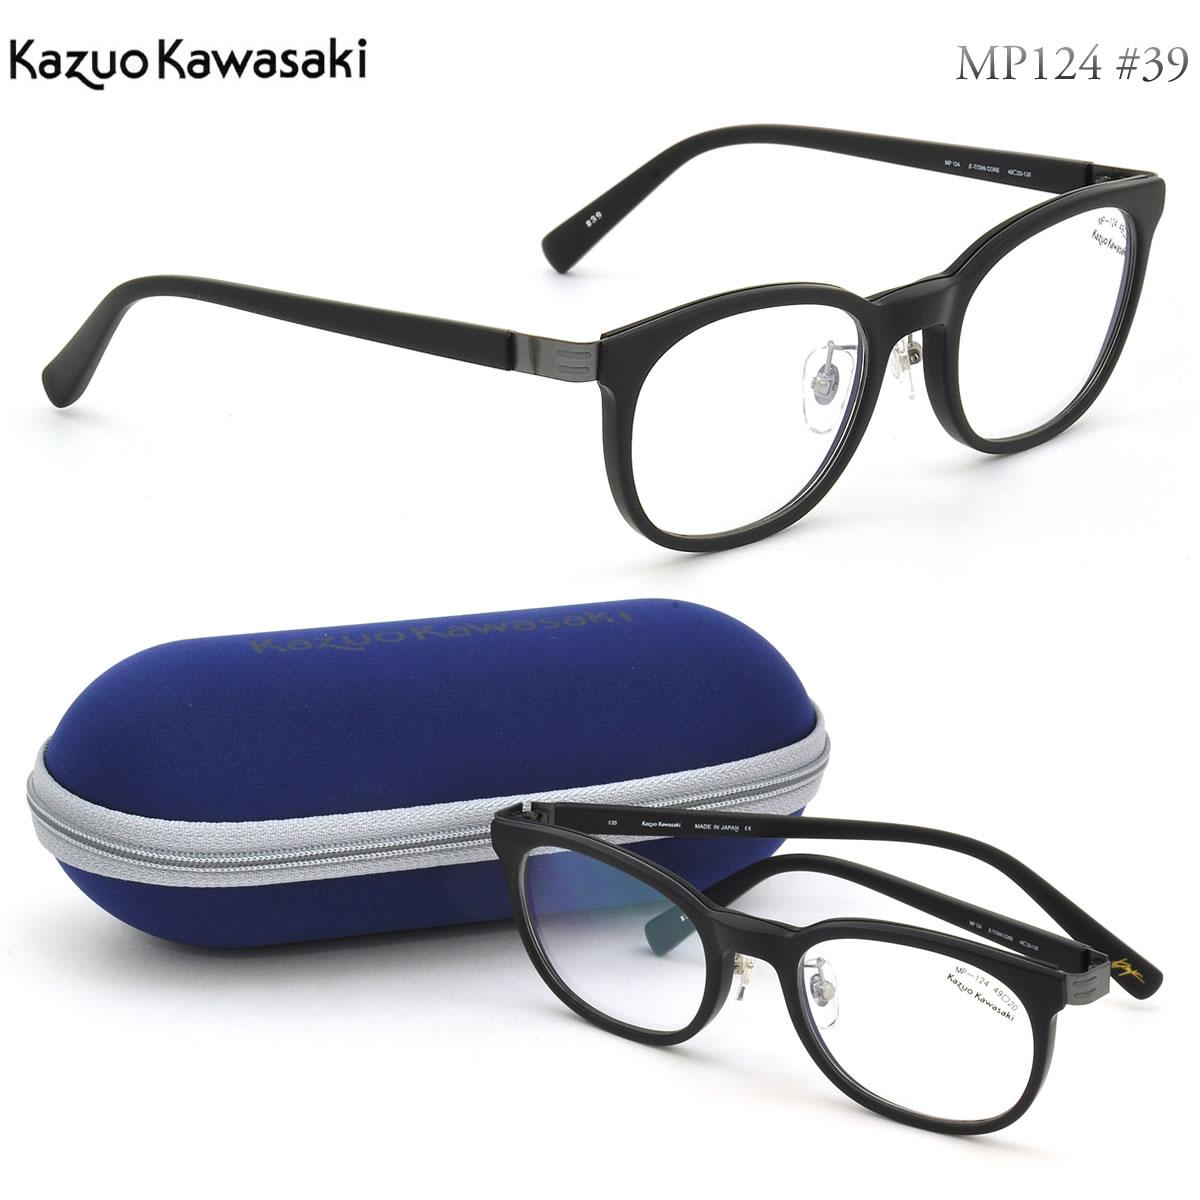 KAZUO KAWASAKI メガネ カワサキカズオ メガネフレーム MP124 39 49サイズ